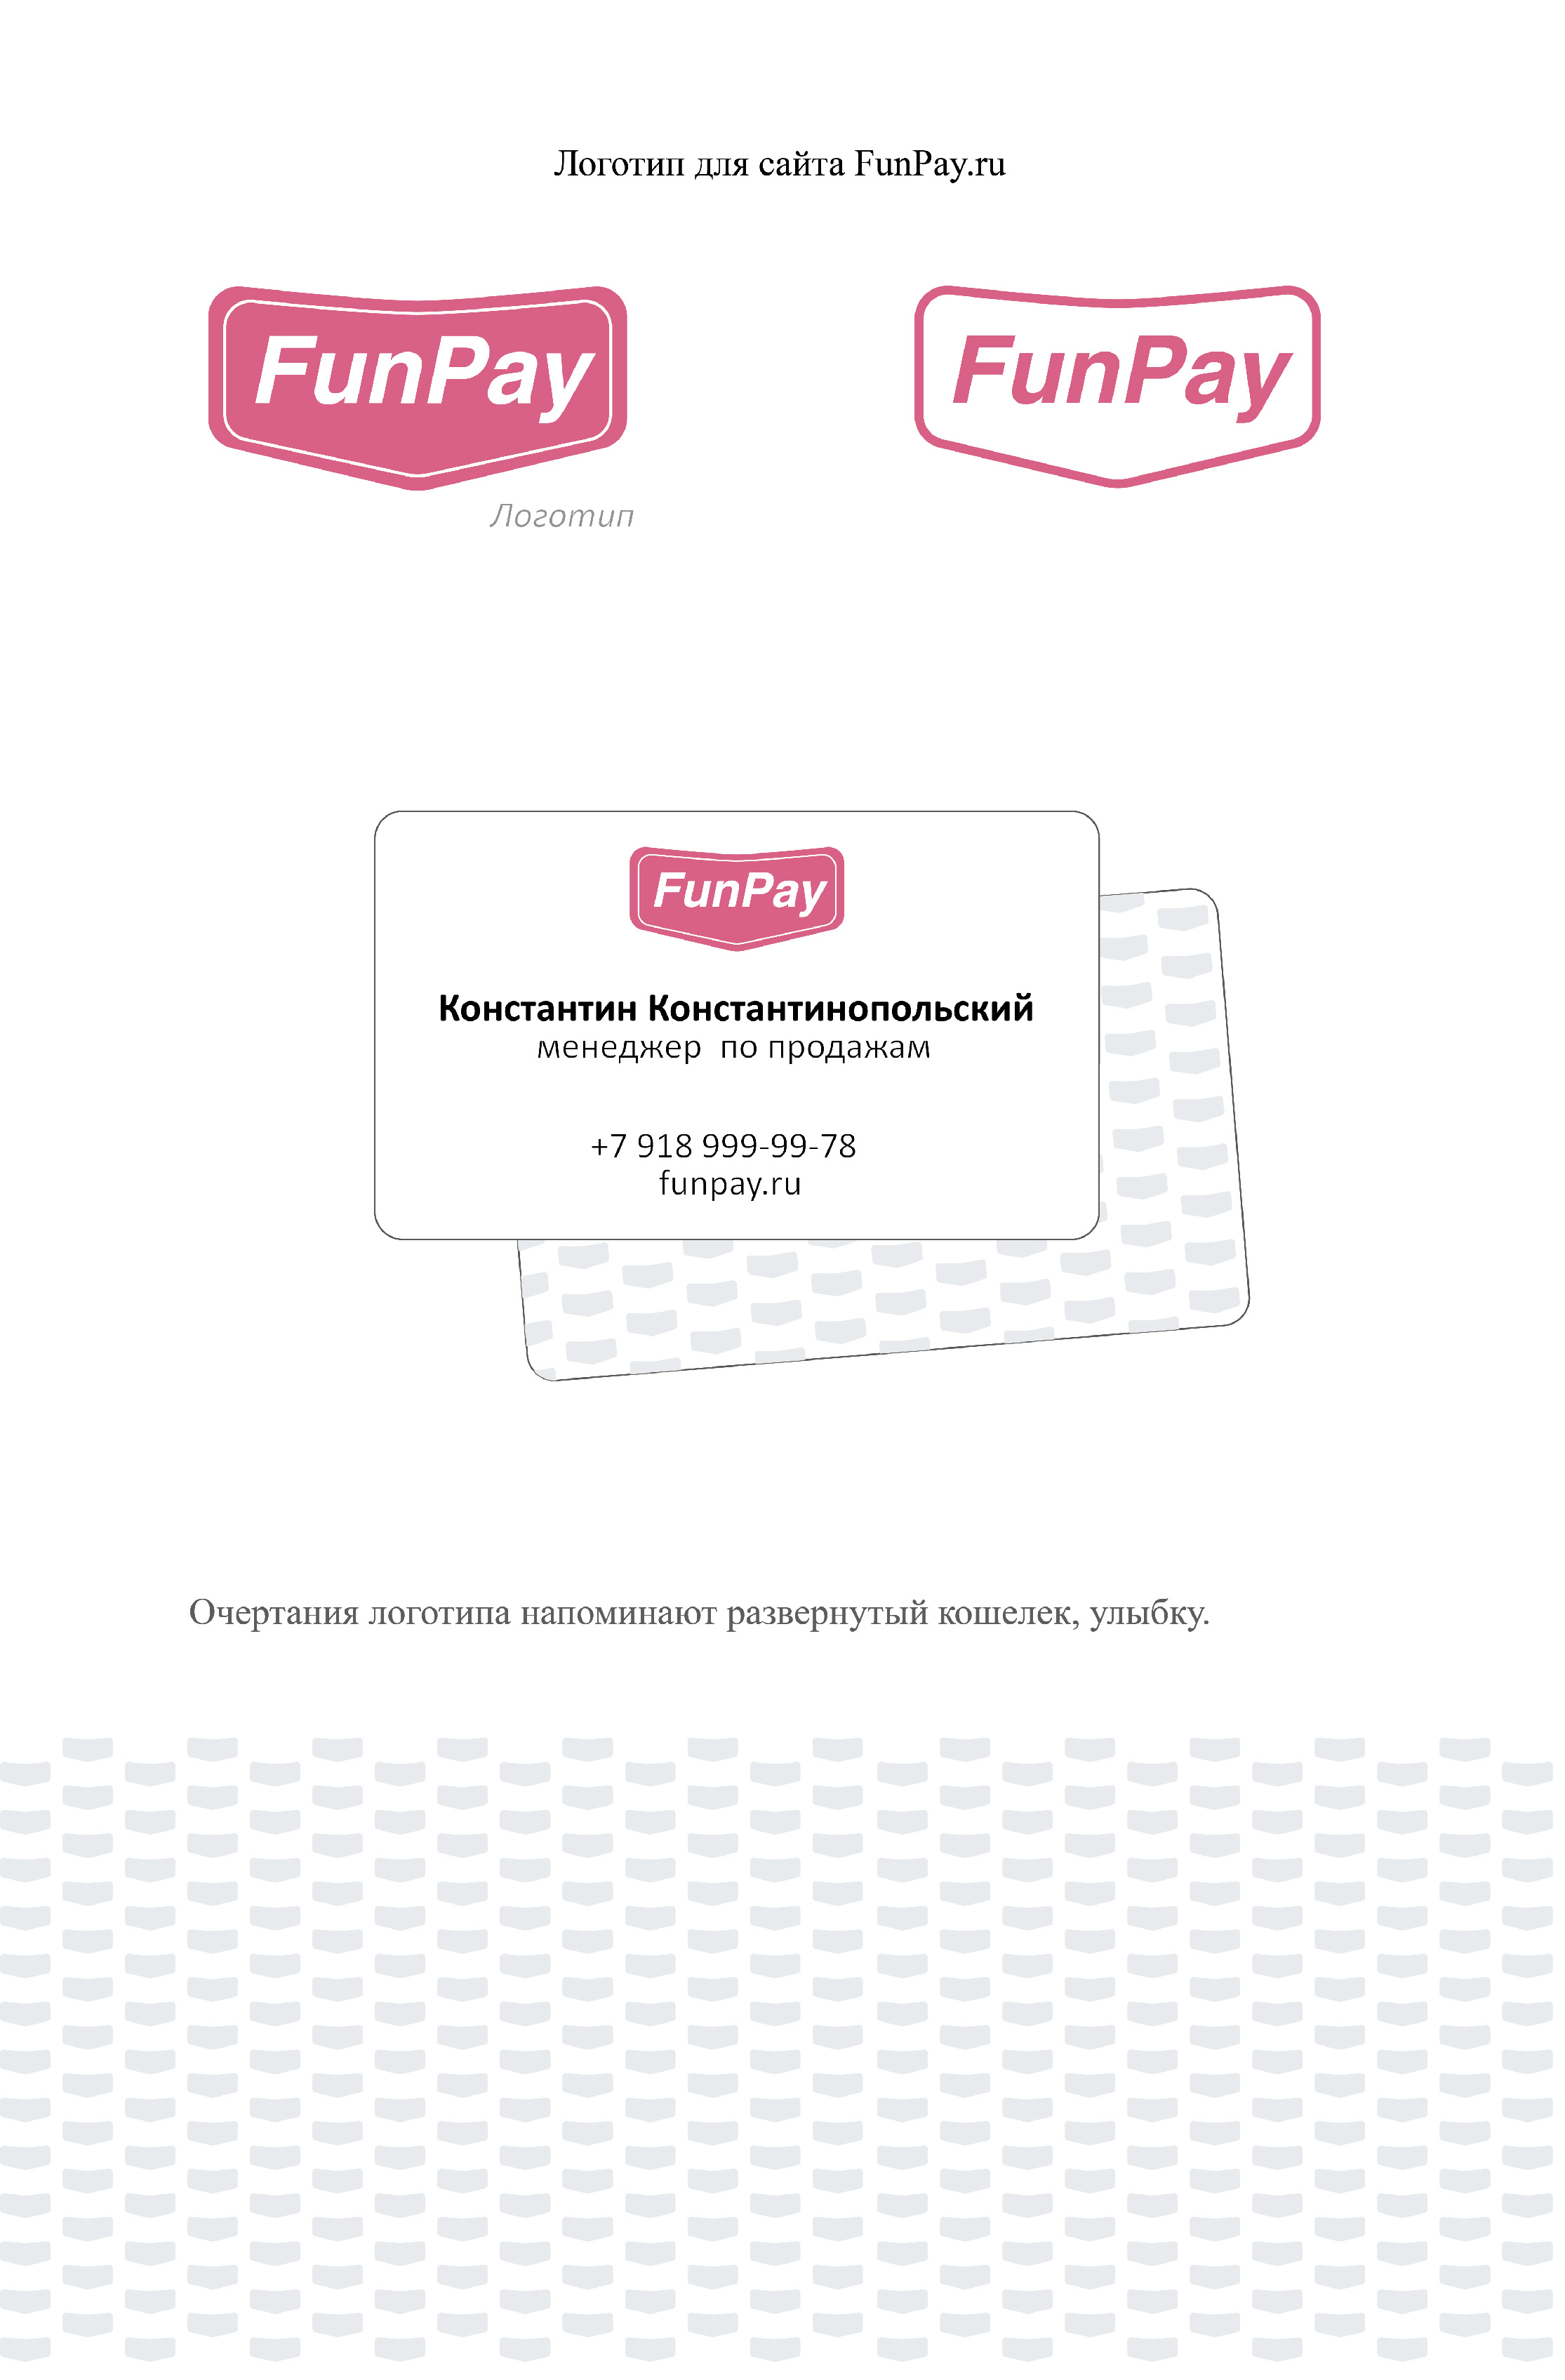 Логотип для FunPay.ru фото f_2635996c7800b3e3.jpg